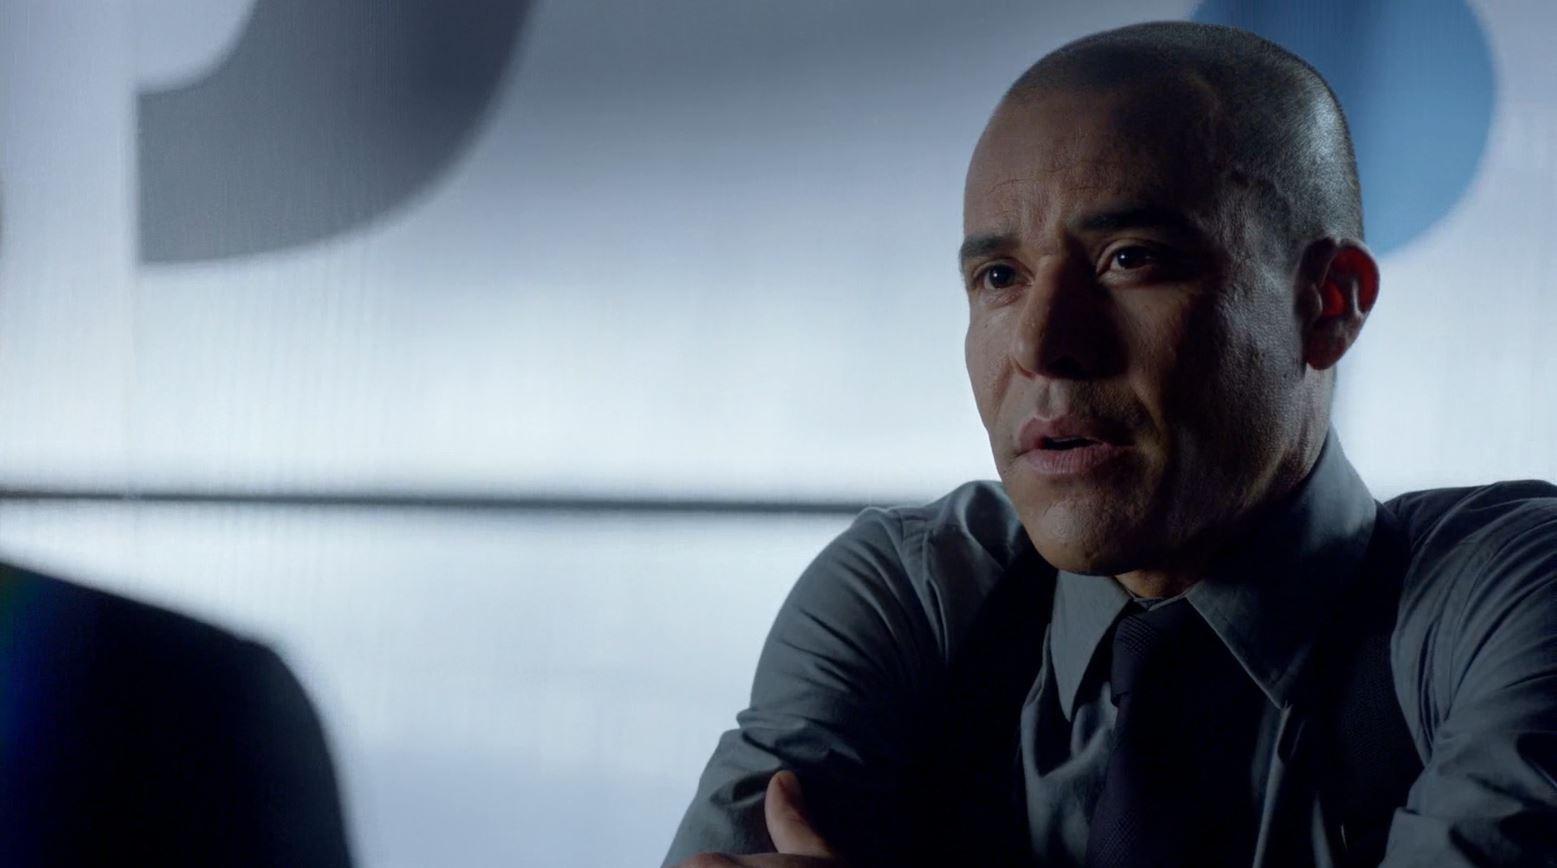 Almost Human - Simon Says - Michael Irby as Detective Richard Paul